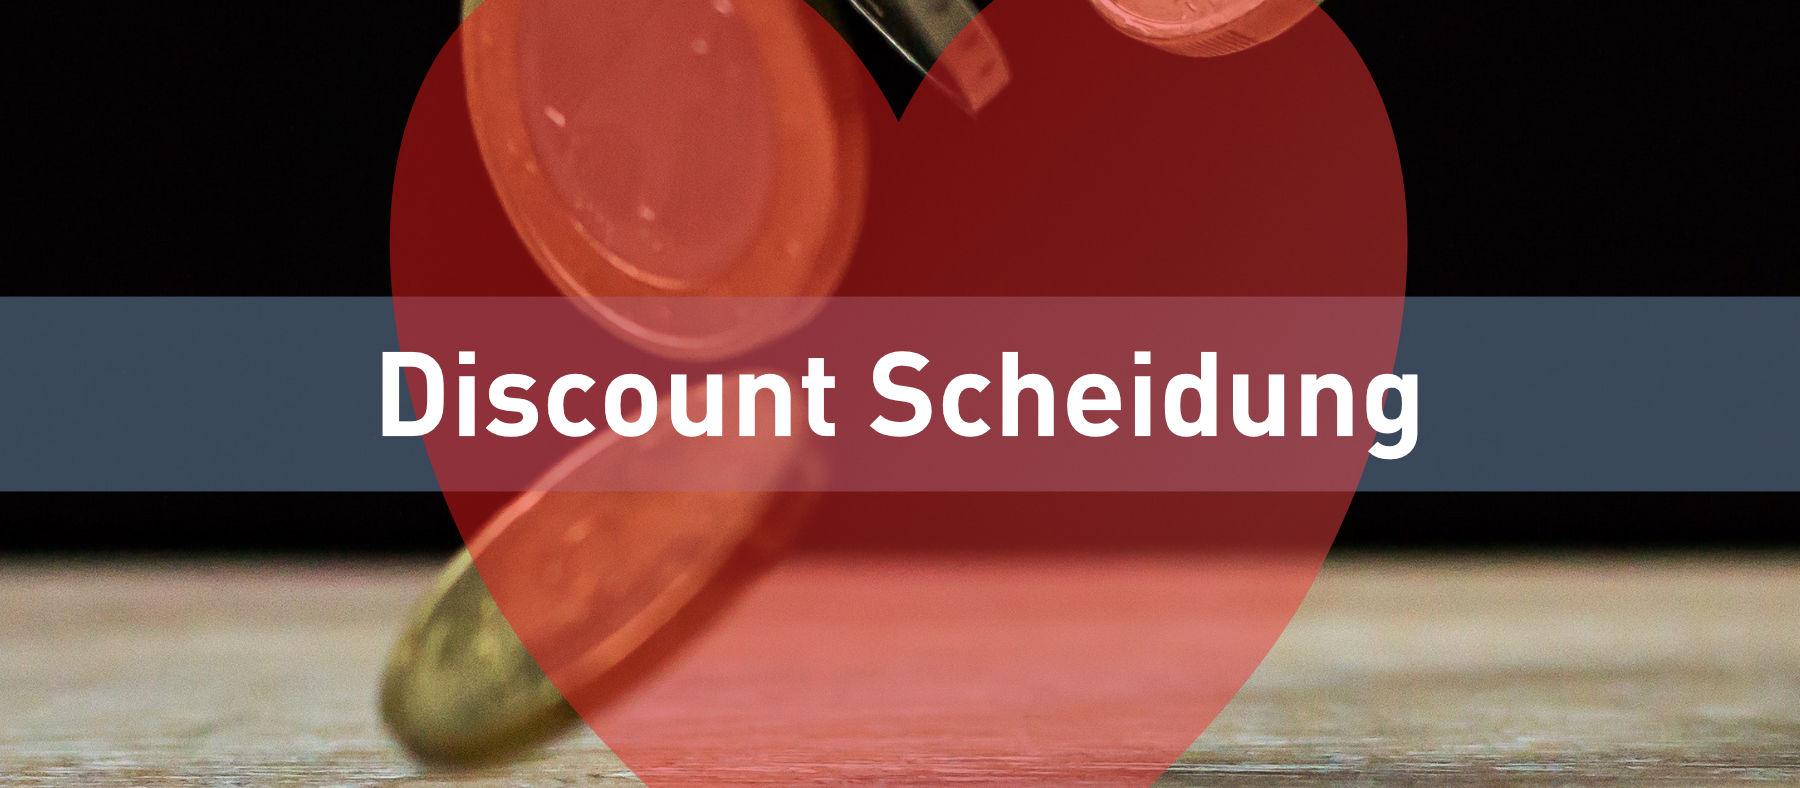 discount-scheidung